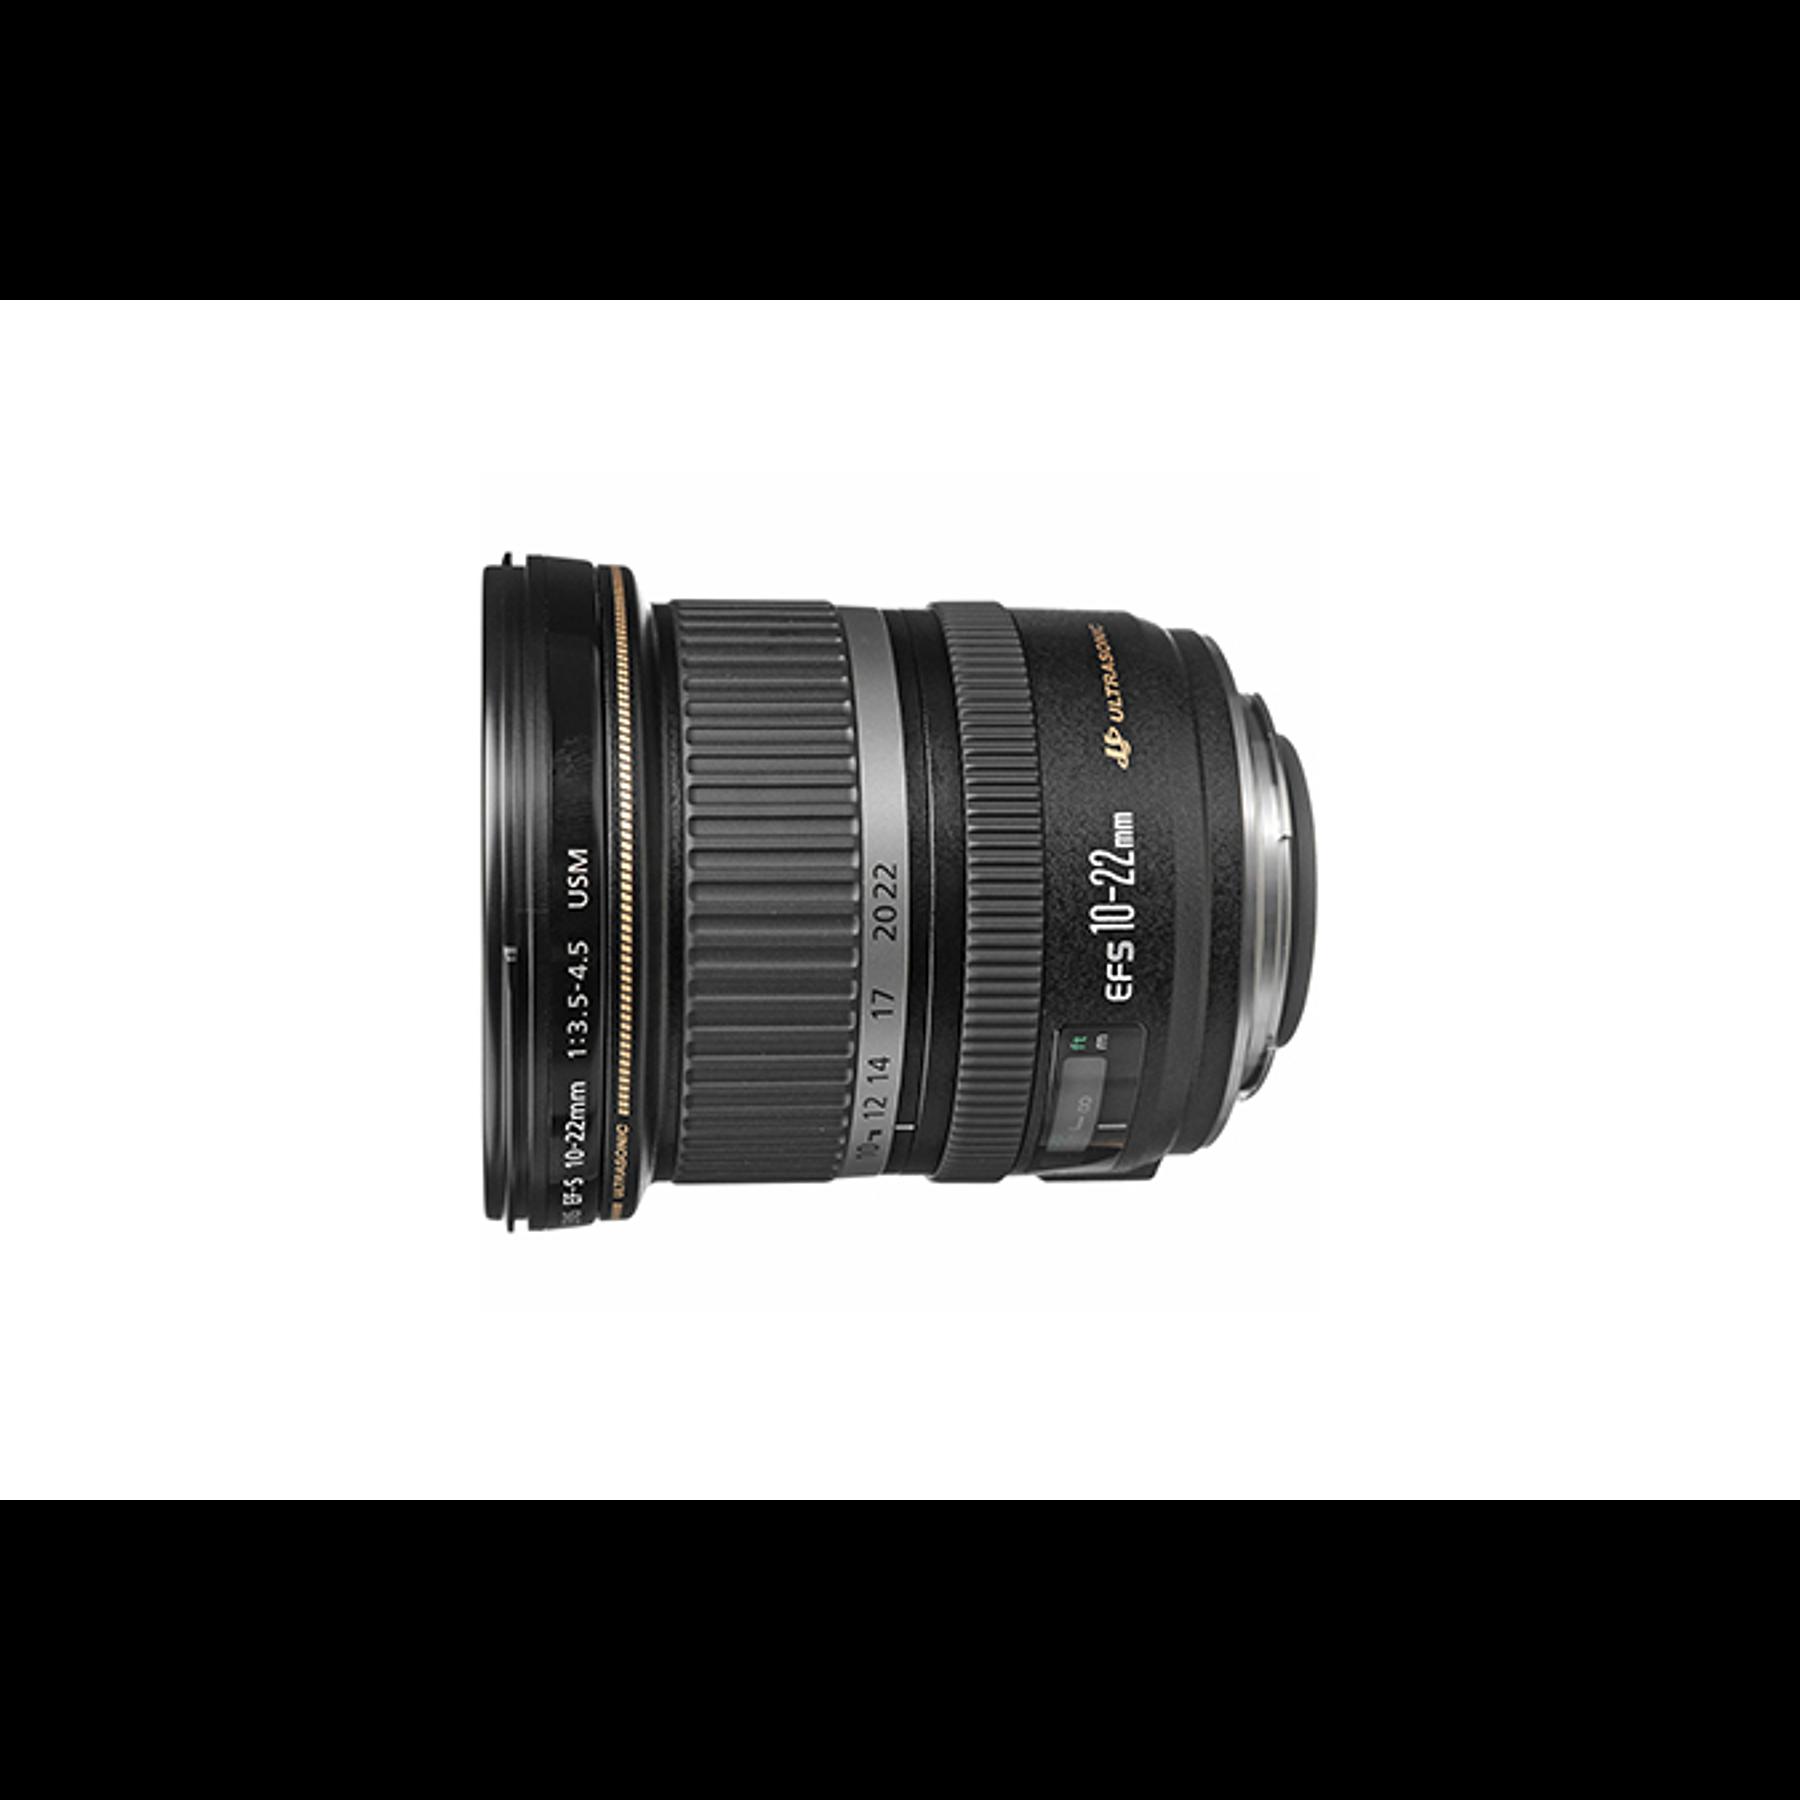 EF-S 10-22MM  F3.5/4.5 USM